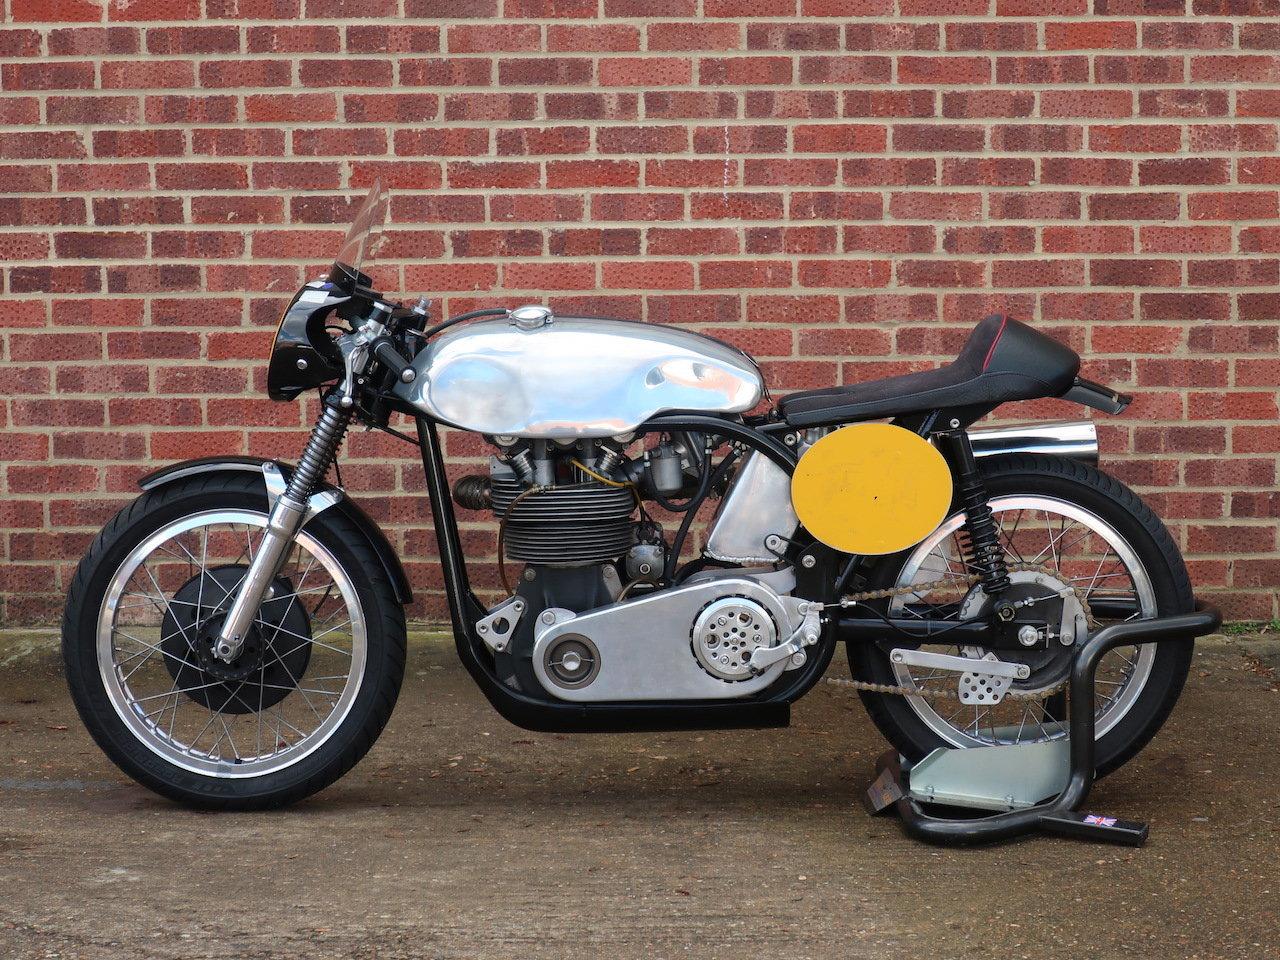 2007 Norton M30 Manx 500cc Race Bike For Sale (picture 4 of 6)